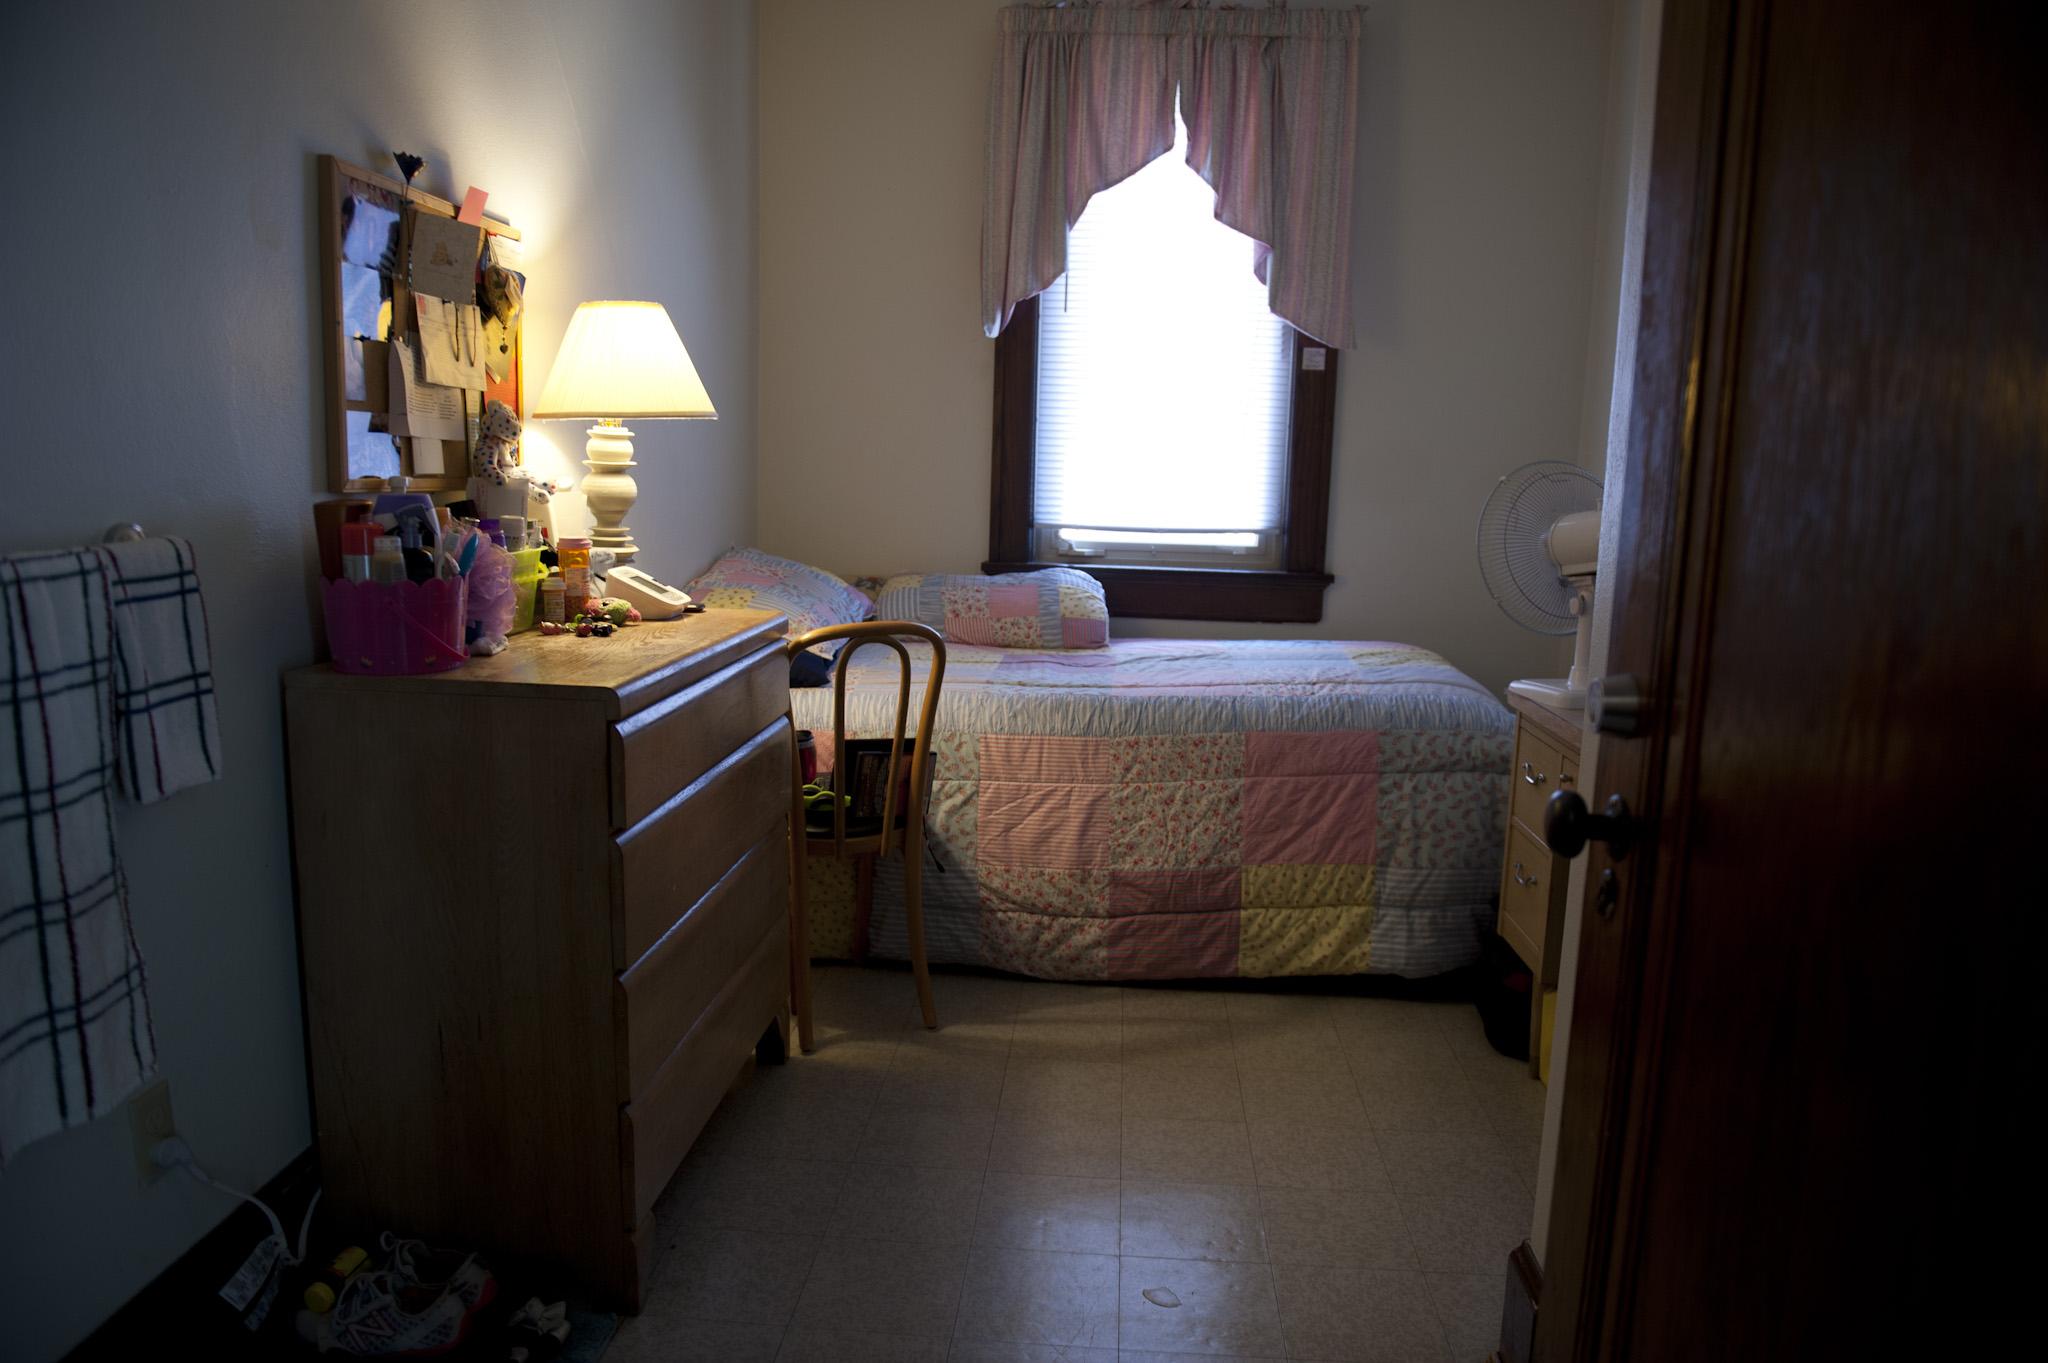 Participant's room